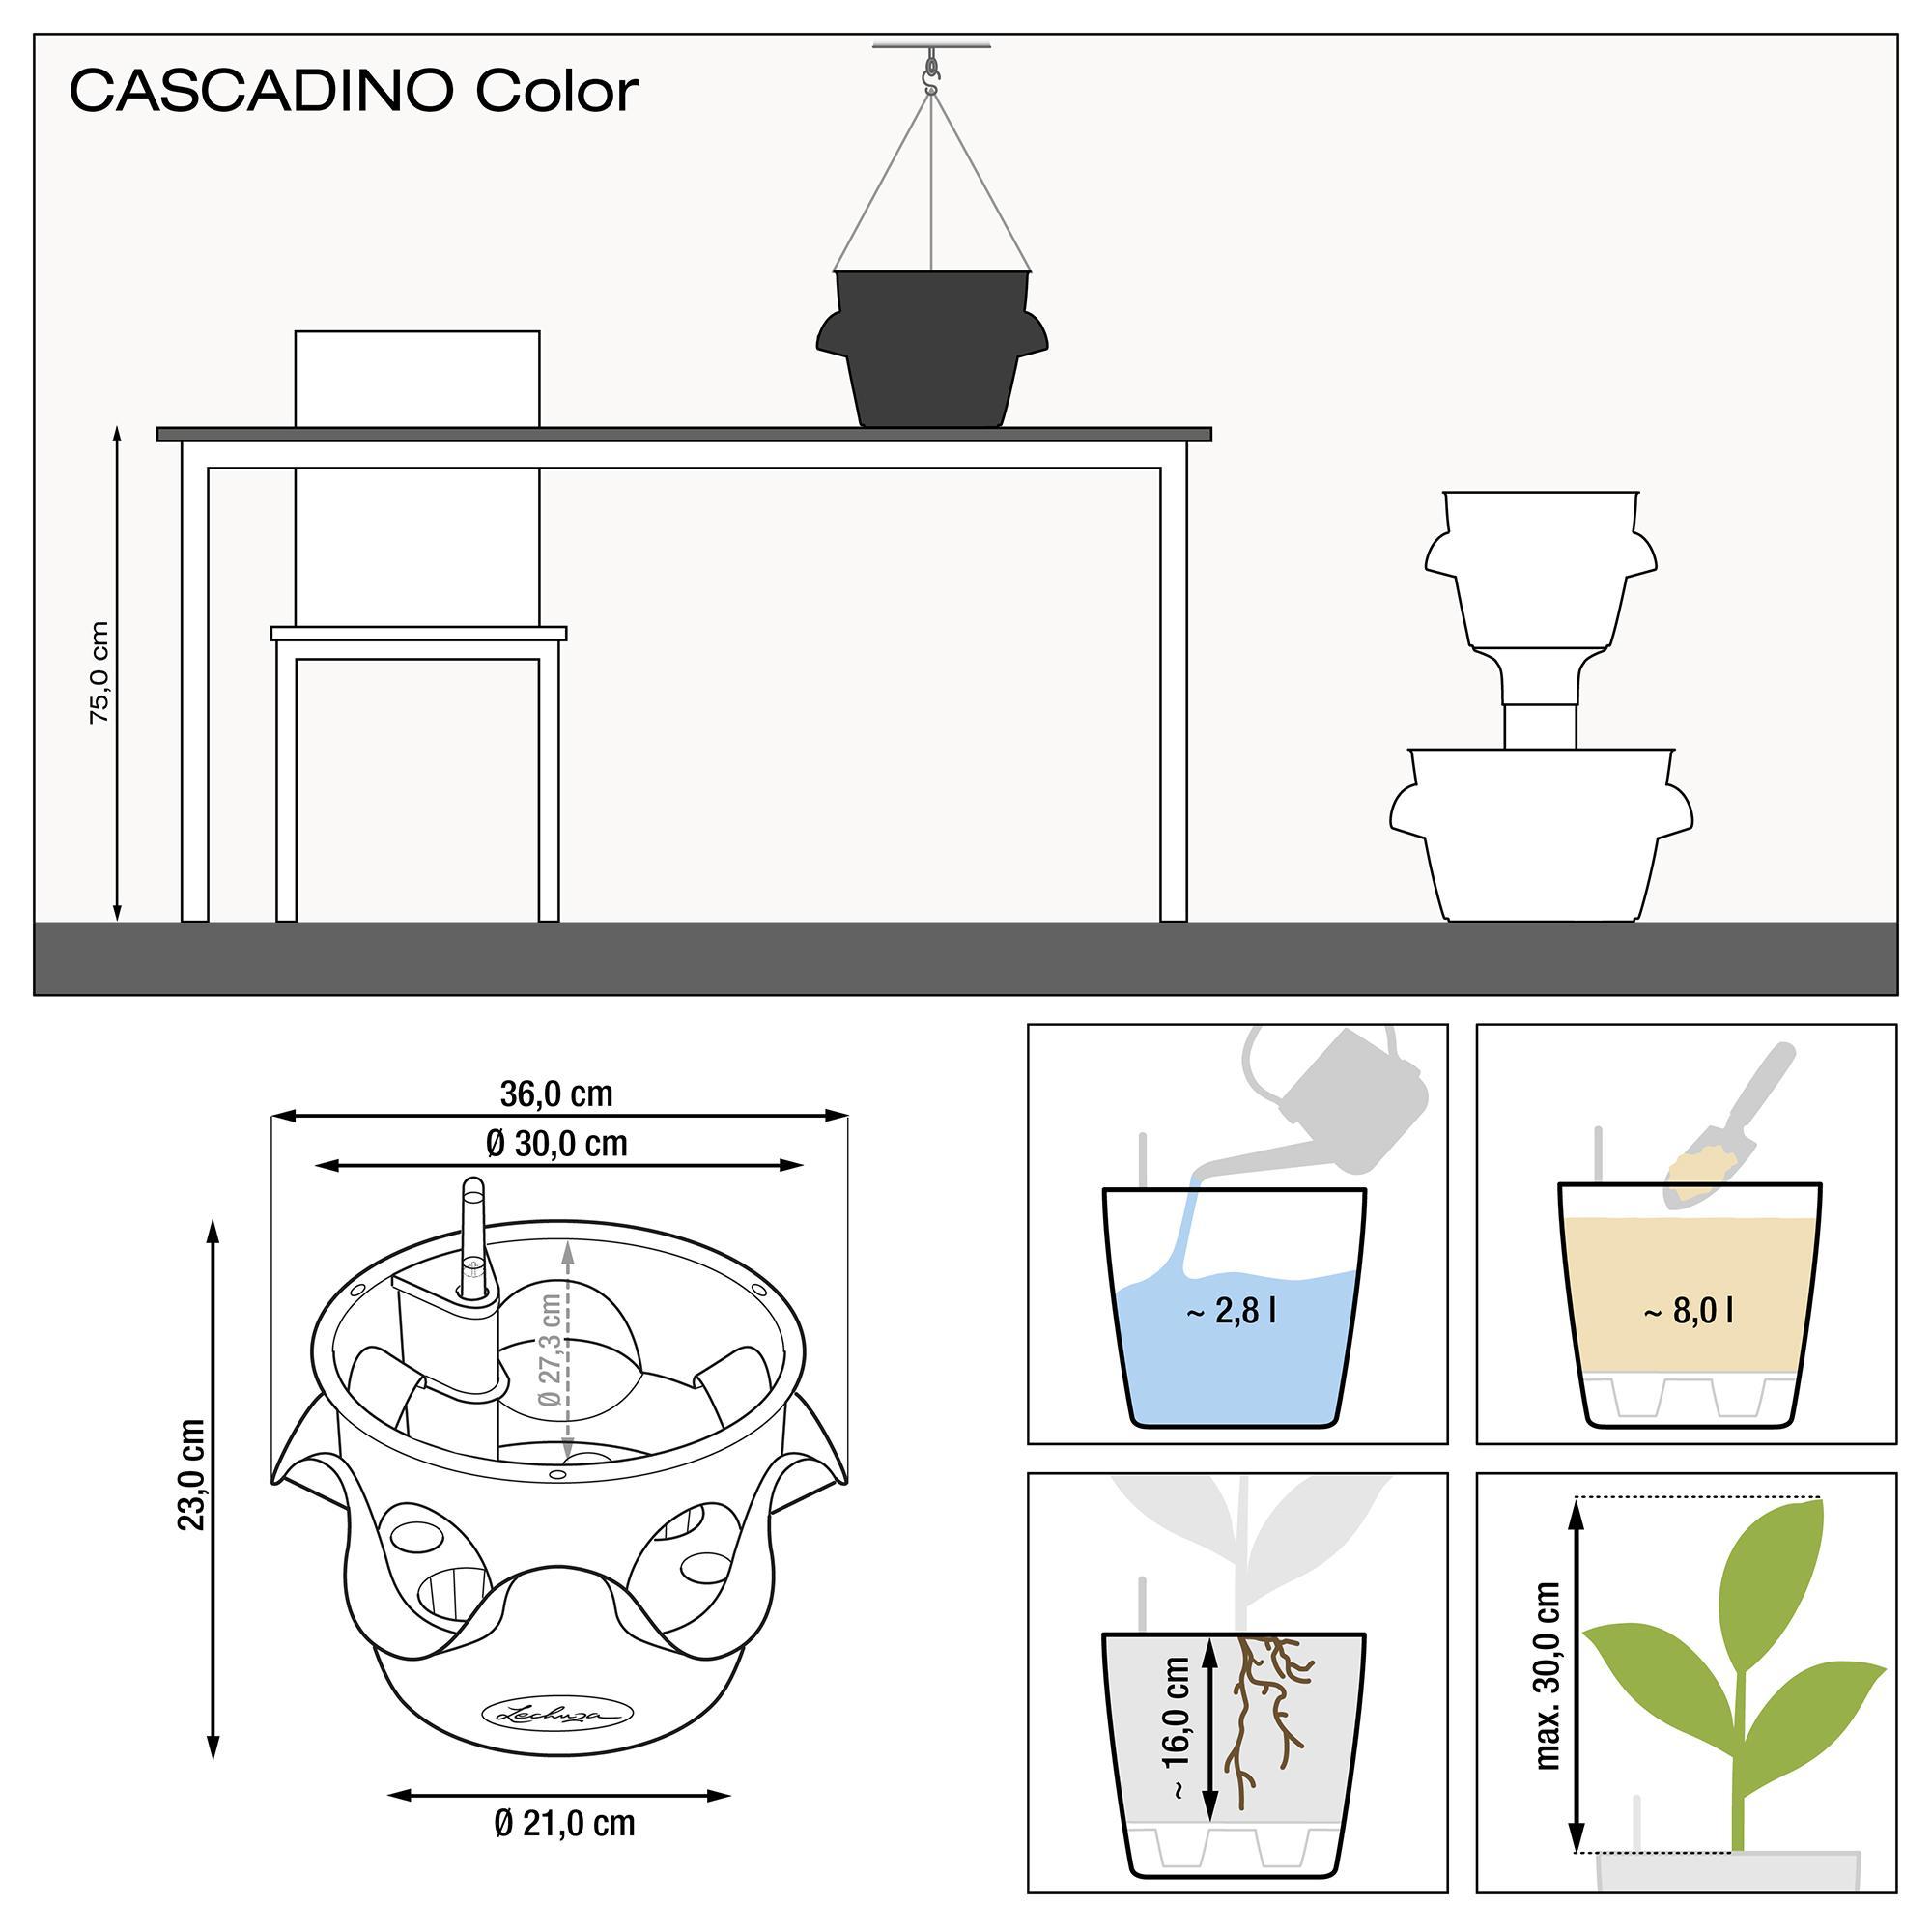 CASCADINO Color Single hanging planter slate - Image 2